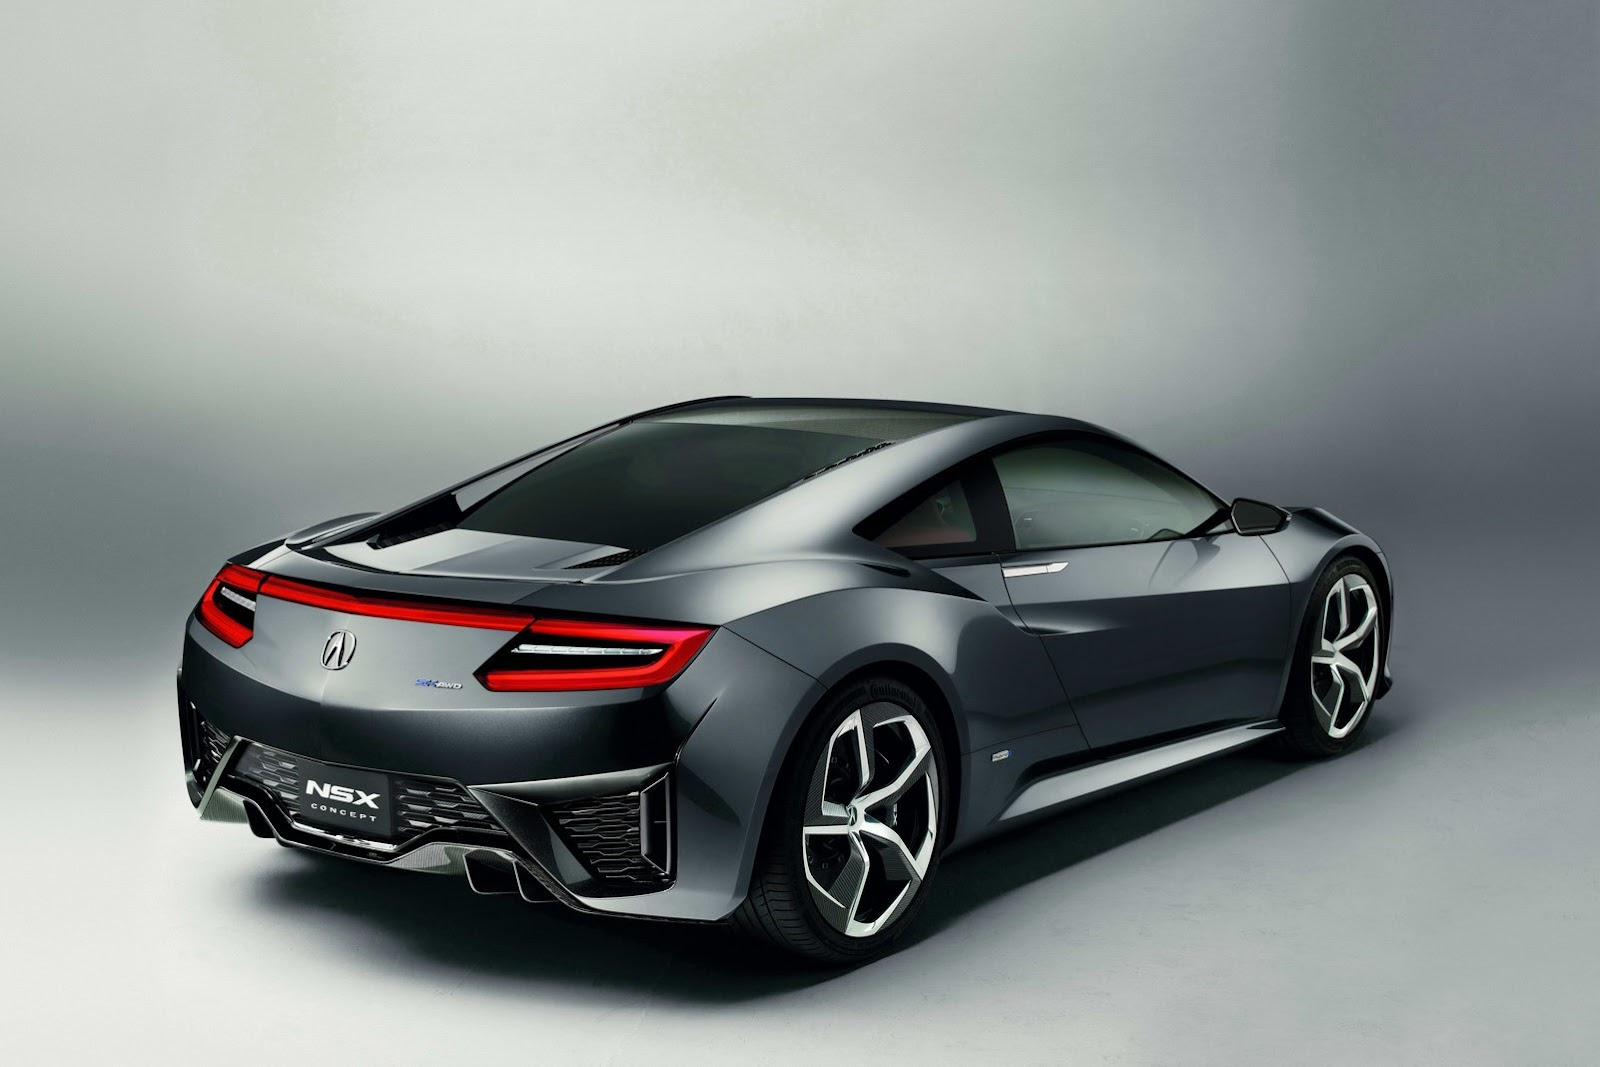 2015 - [Honda] NSX - Page 6 2015-Acura-Honda-NSX-Concept-II-13%25255B2%25255D